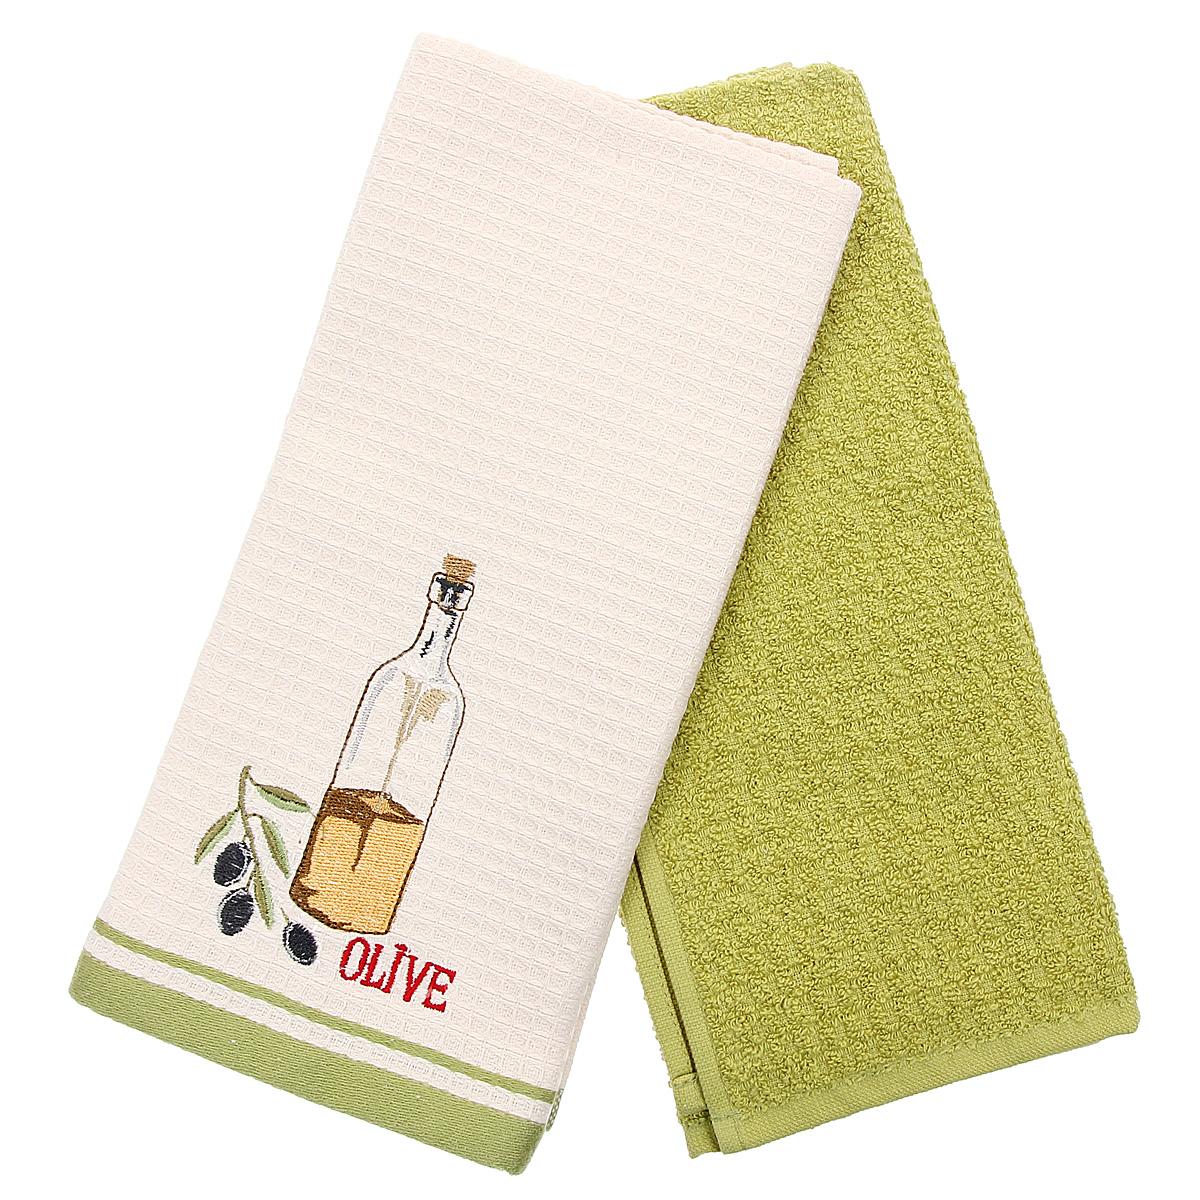 Набор кухонных полотенец Coronet Масло, цвет: зеленый, бежевый, 40 х 60 см, 2 штК-МП-5010-05-09-03